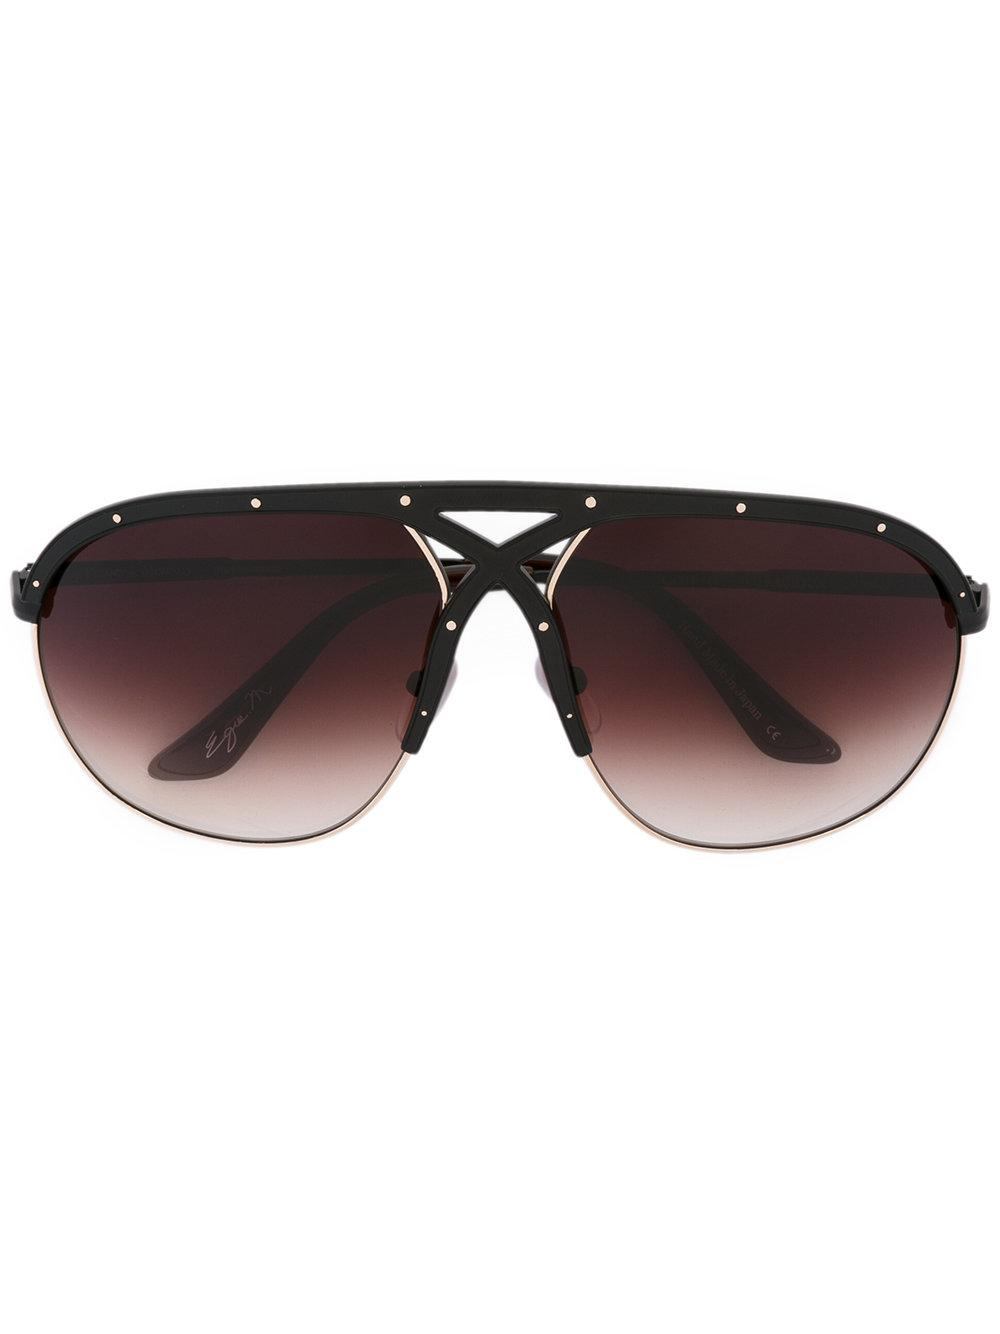 Frency & Mercury 'voracious' Sonnenbrille In Black